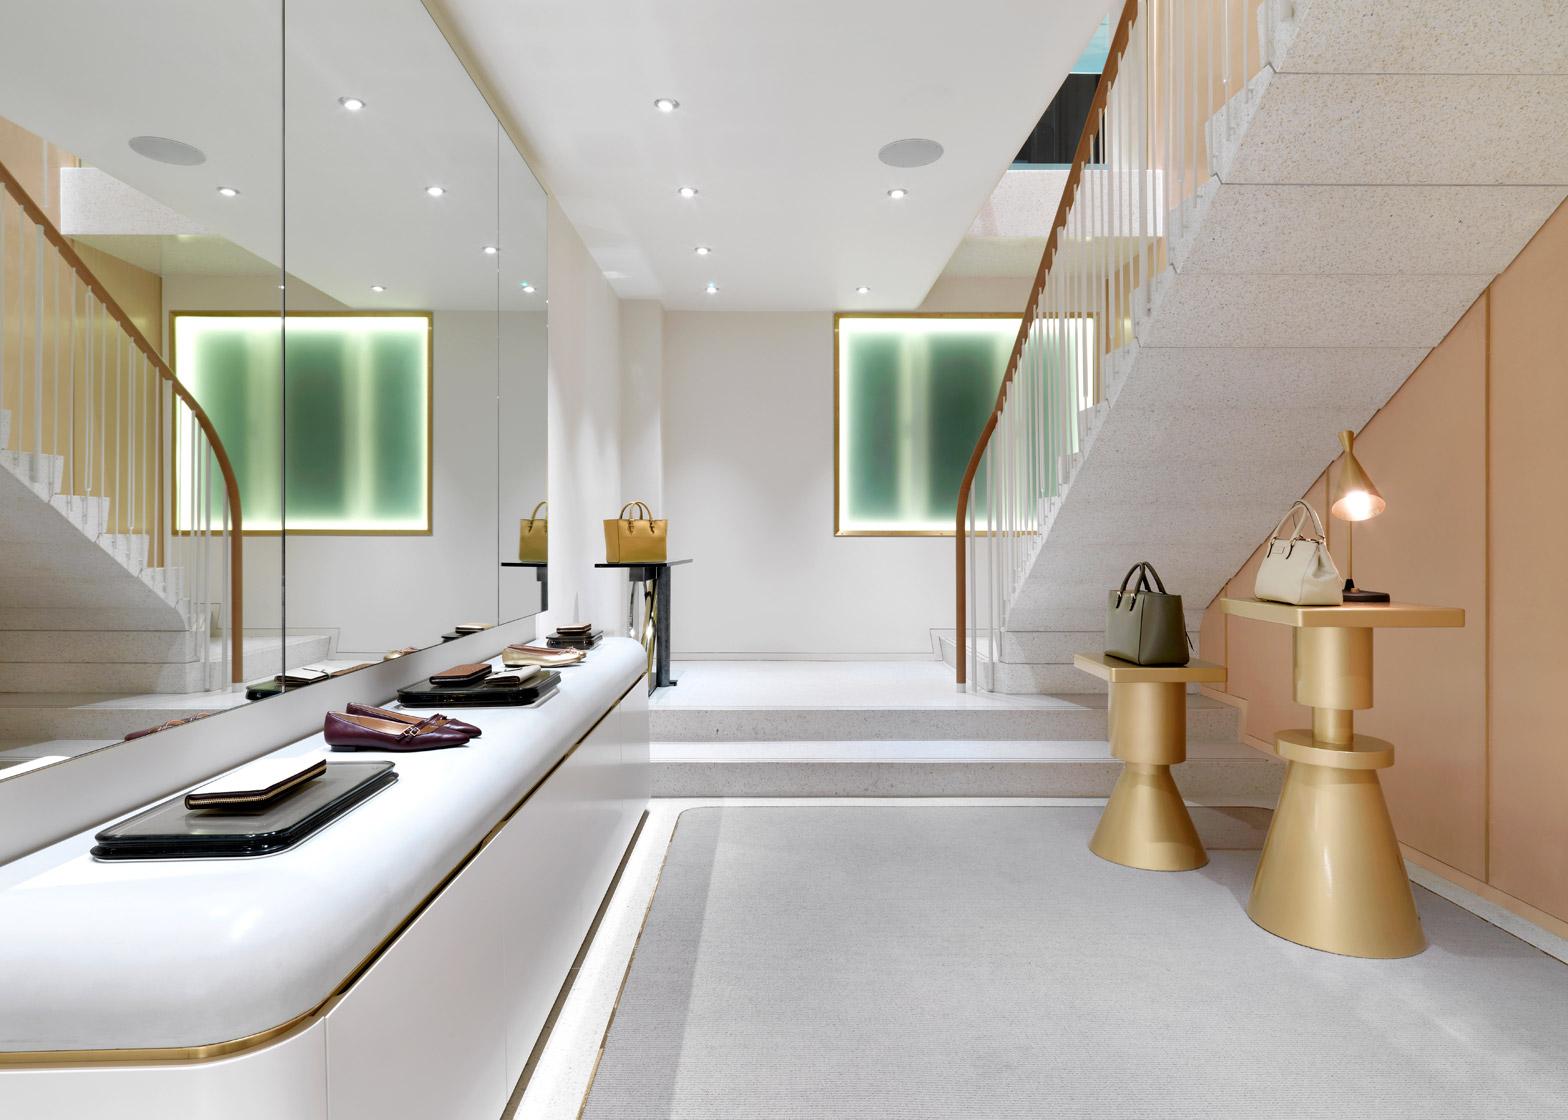 j-and-m-davidson-flagship-by-universal-design-Studio_dezeen_1568_3